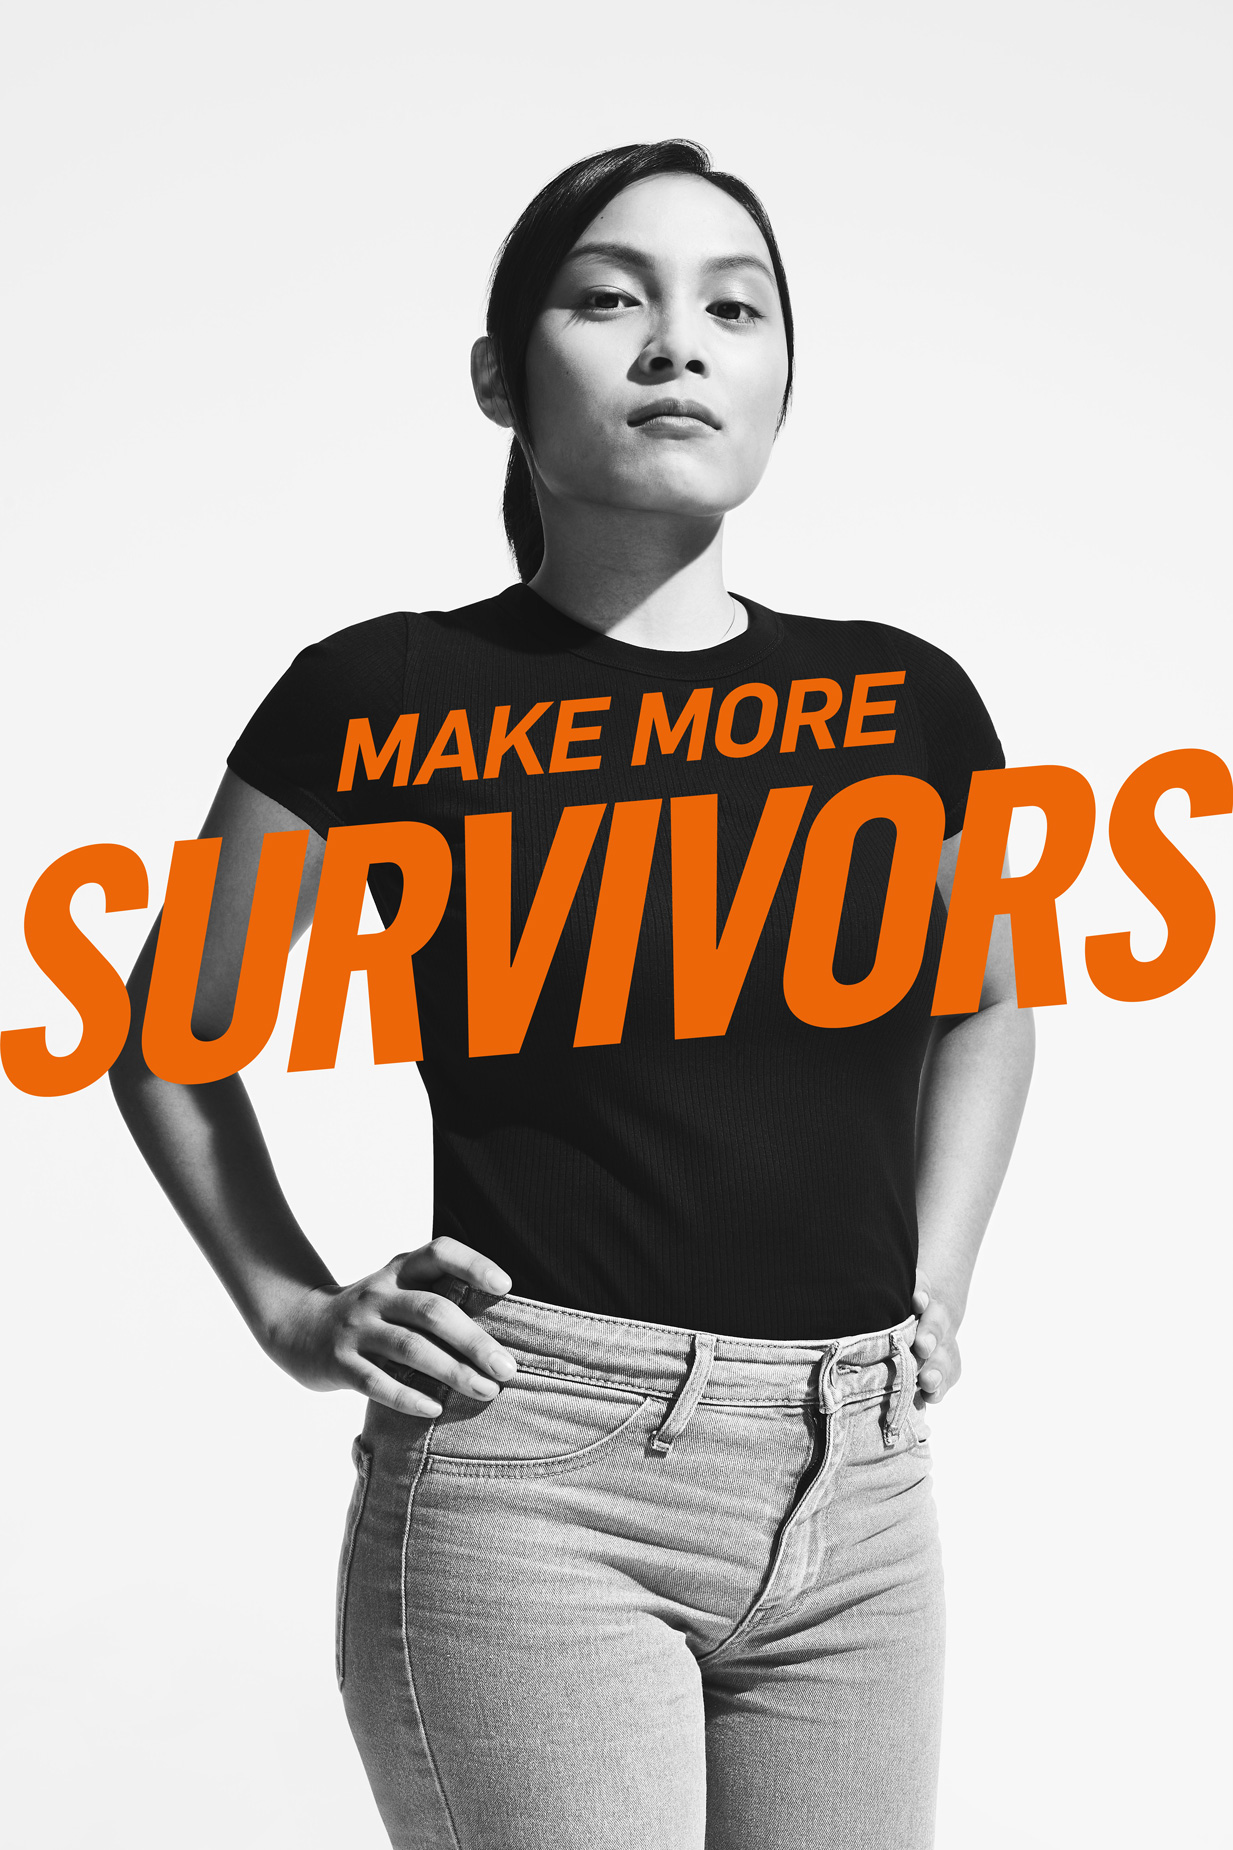 Make More Survivors